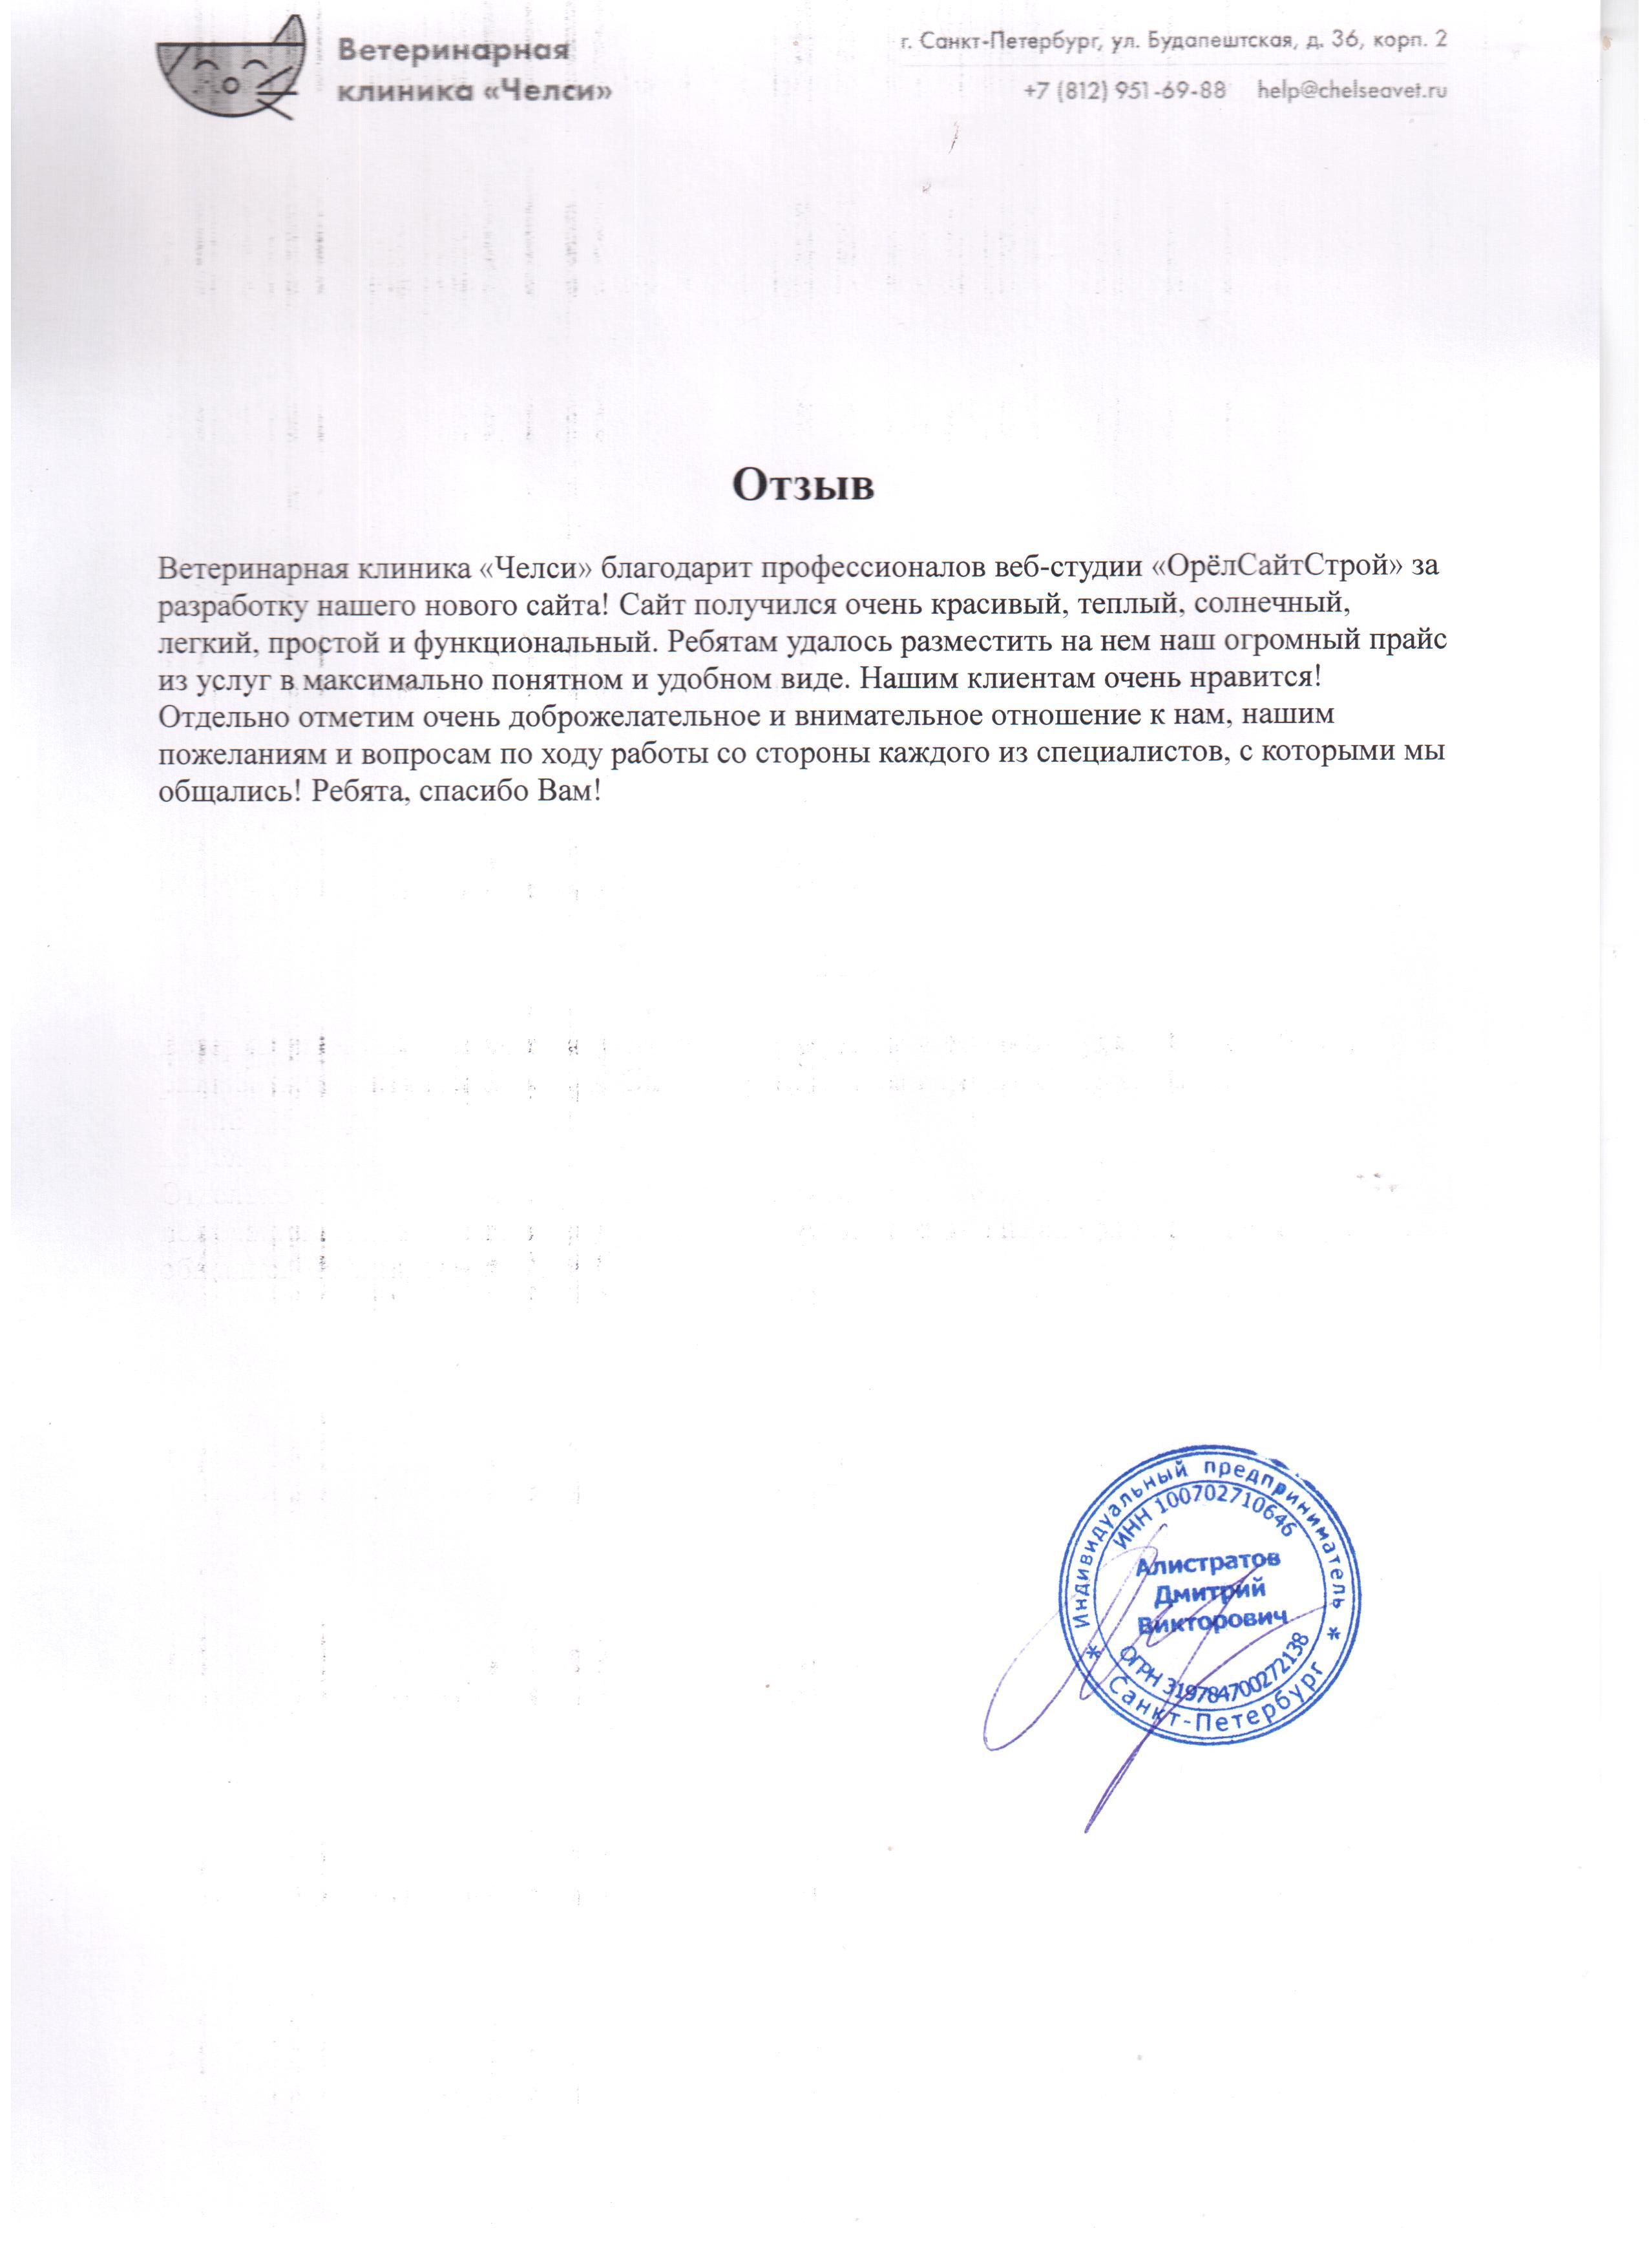 Отзыв «Челси» о компании ОрёлСайтСтрой